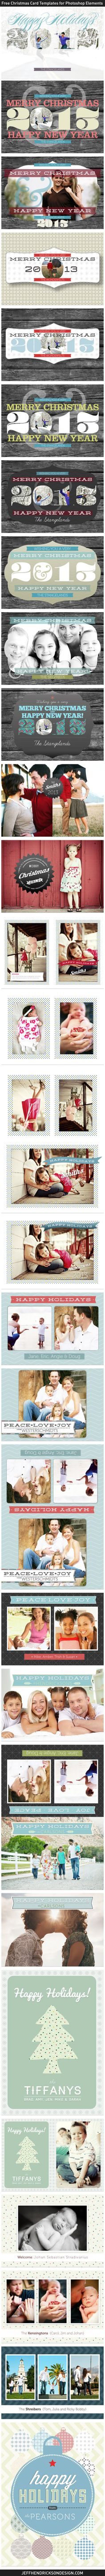 29 Free Christmas / Holiday card templates for Photoshop Elements.  Hi-res, printable 7x5 & 5x7.     @Kaeleigh Melton Mae